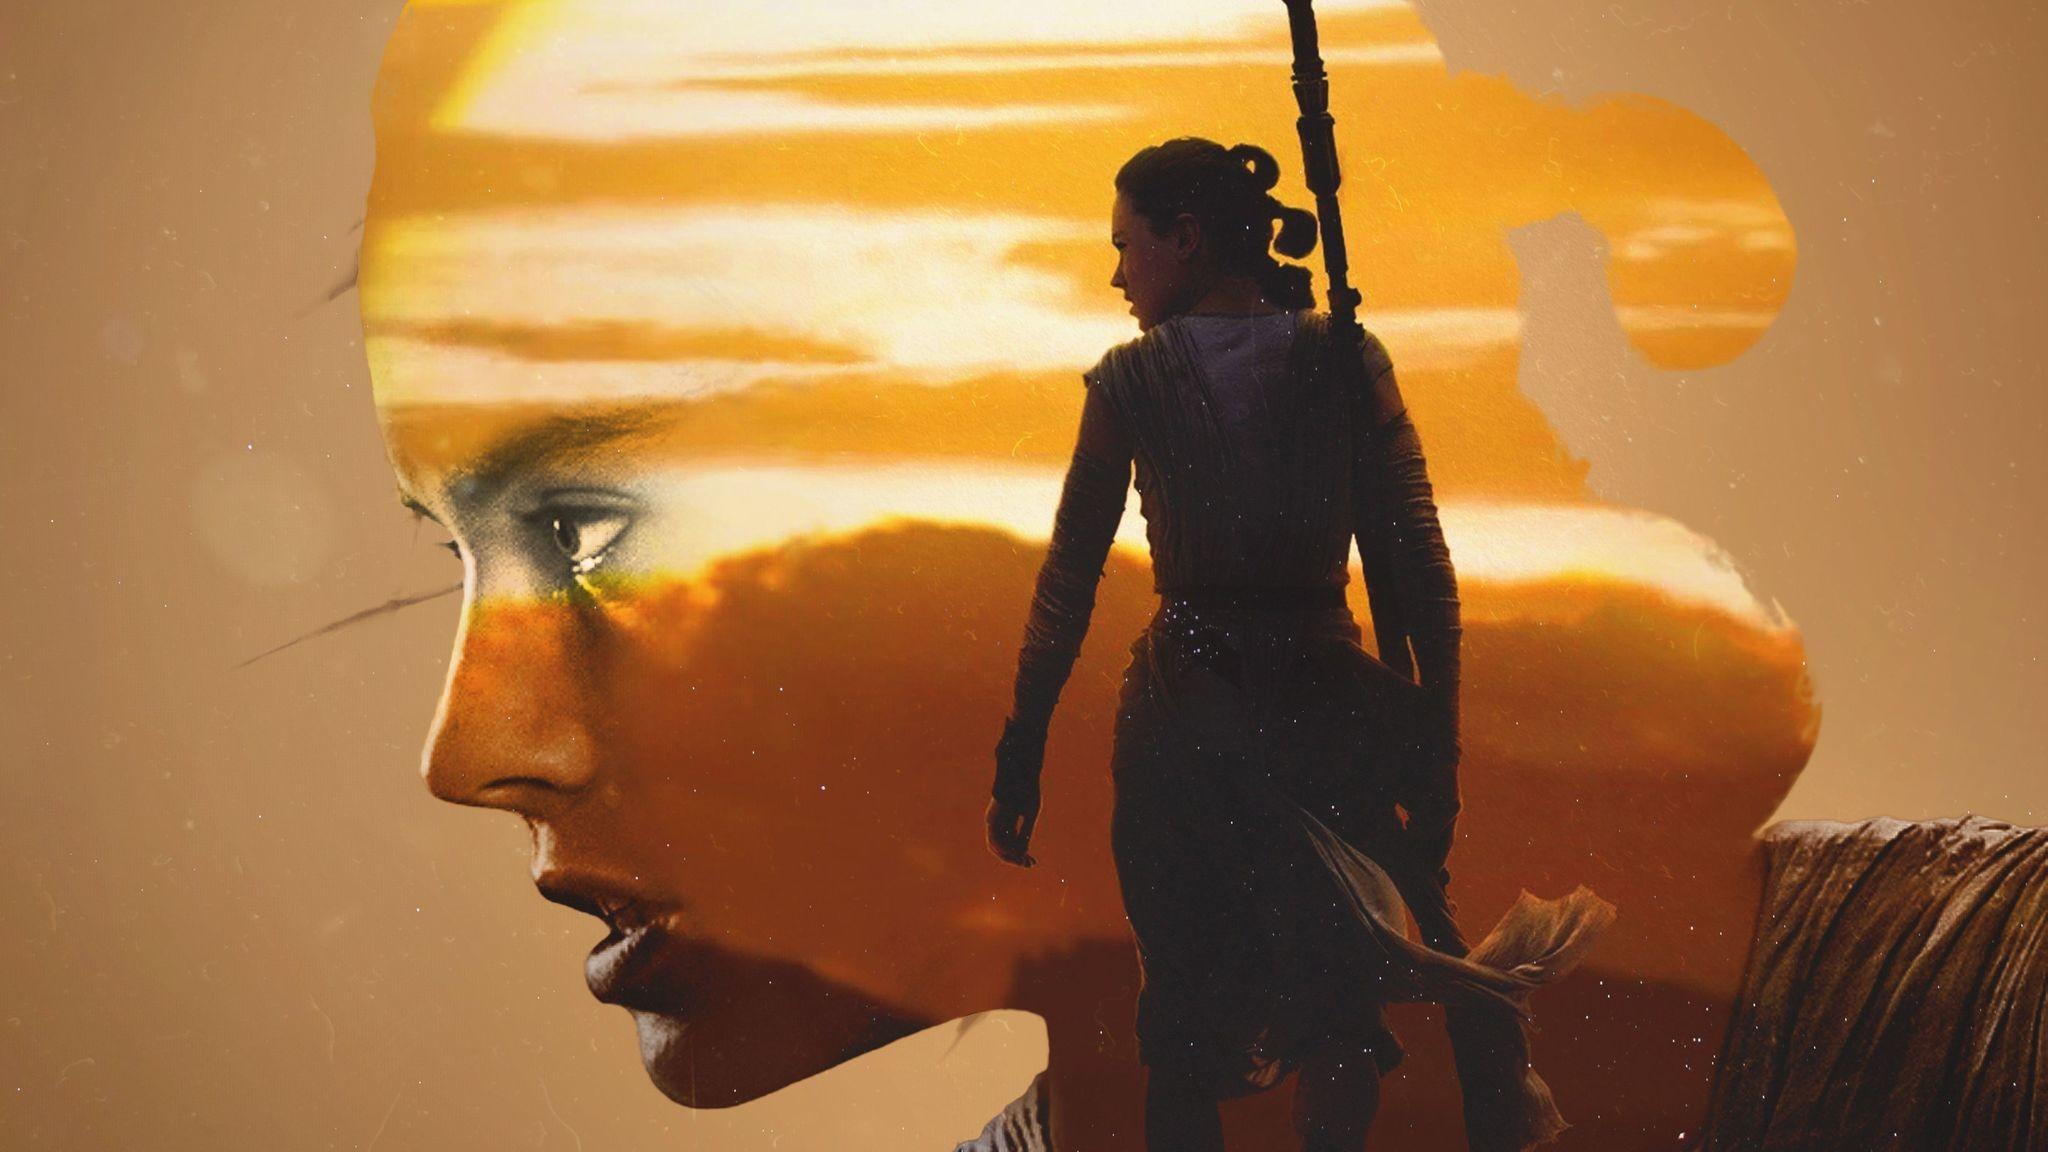 rey-star-wars-artwork-new.jpg